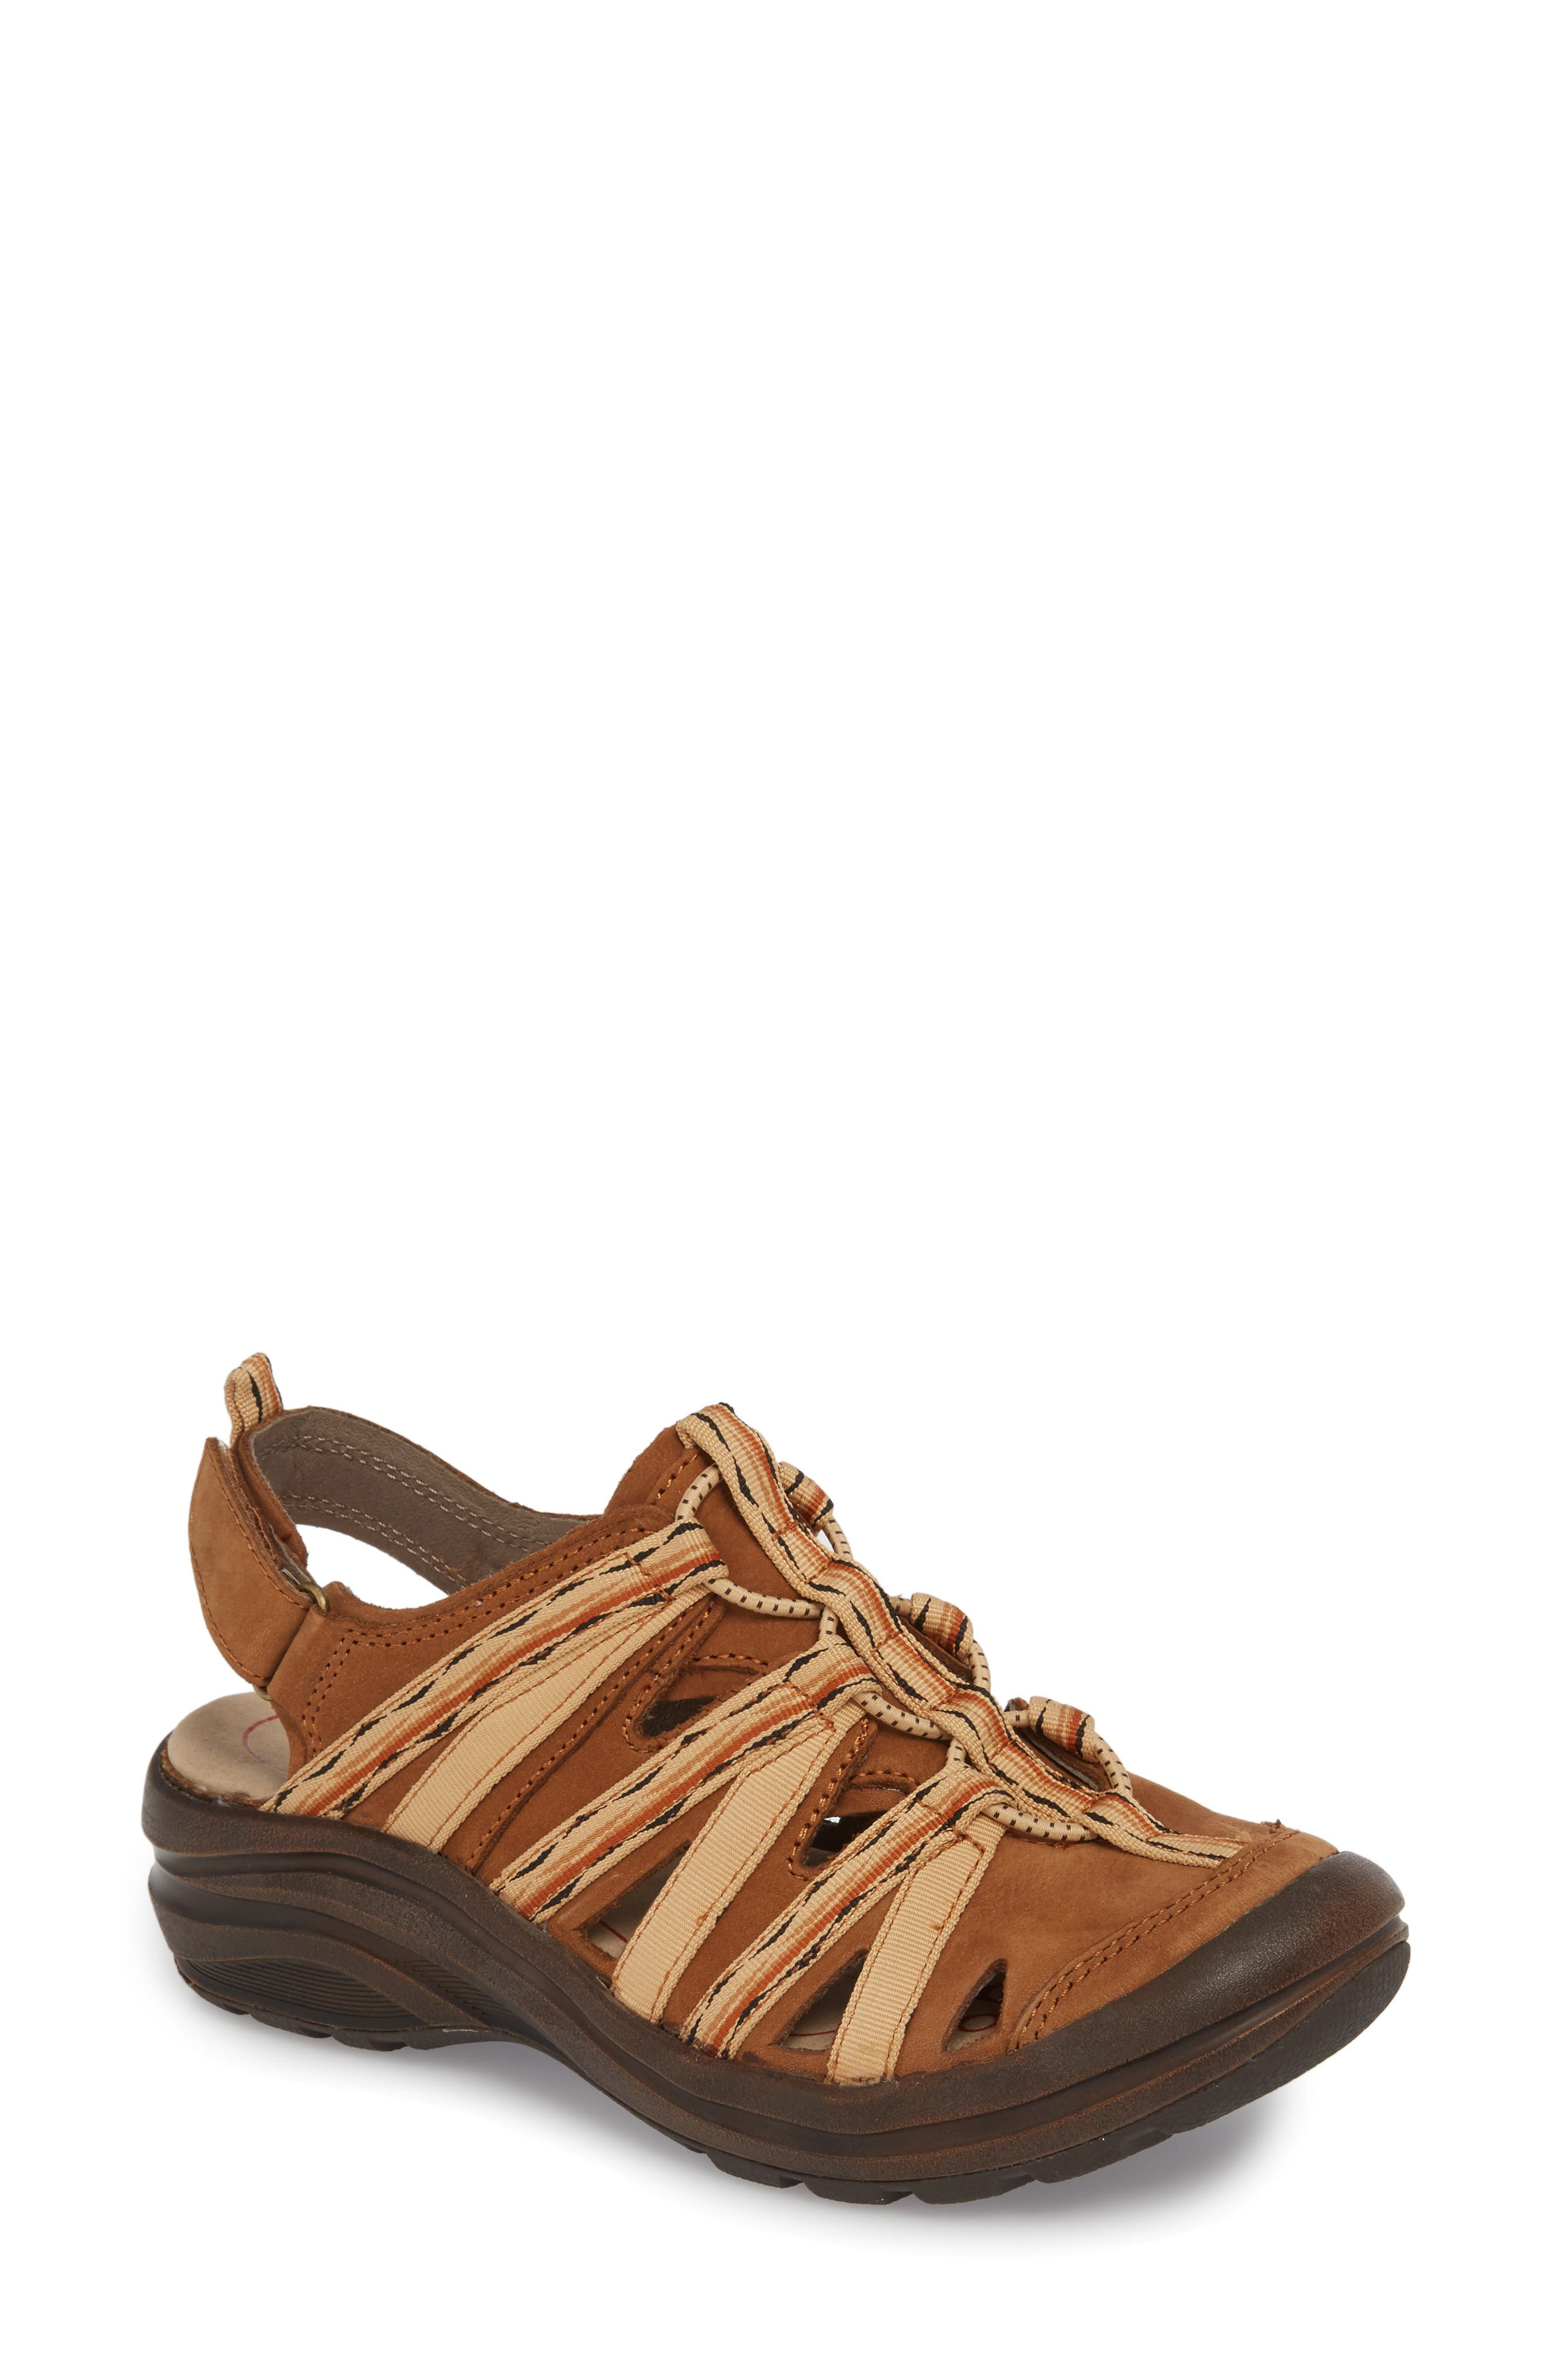 Bionica Malabar Sport Sandal, Brown